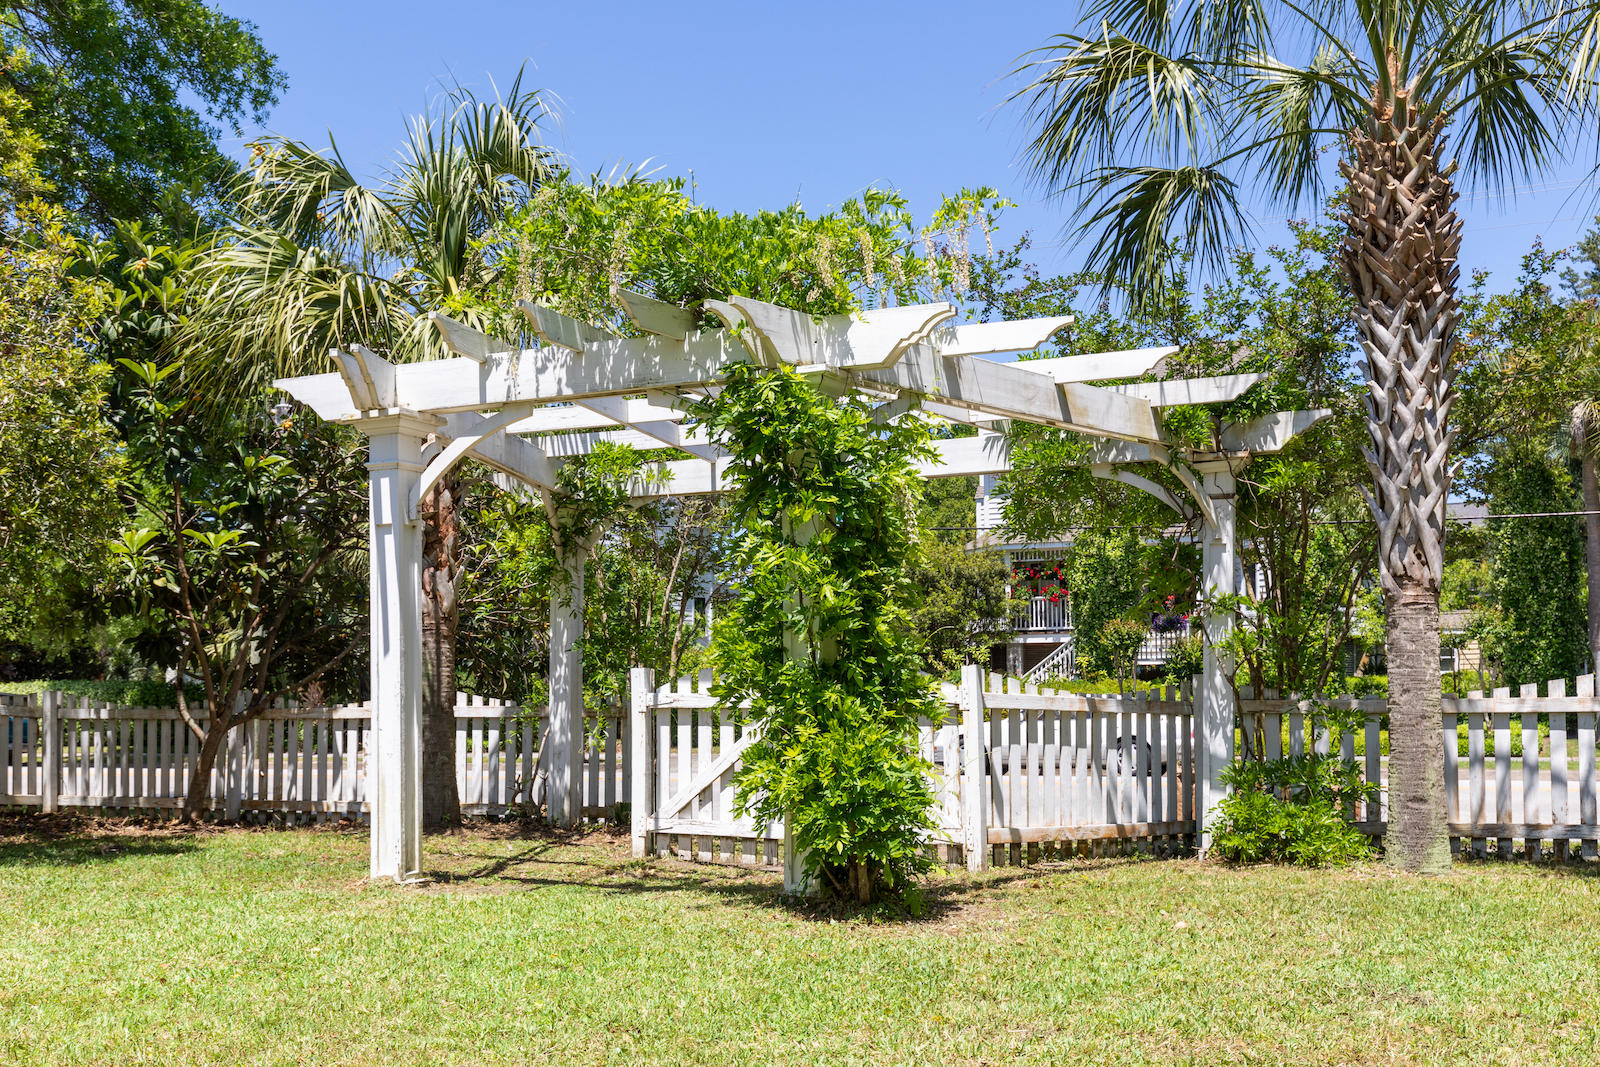 Sullivans Island Homes For Sale - 1318 Poe, Sullivans Island, SC - 20